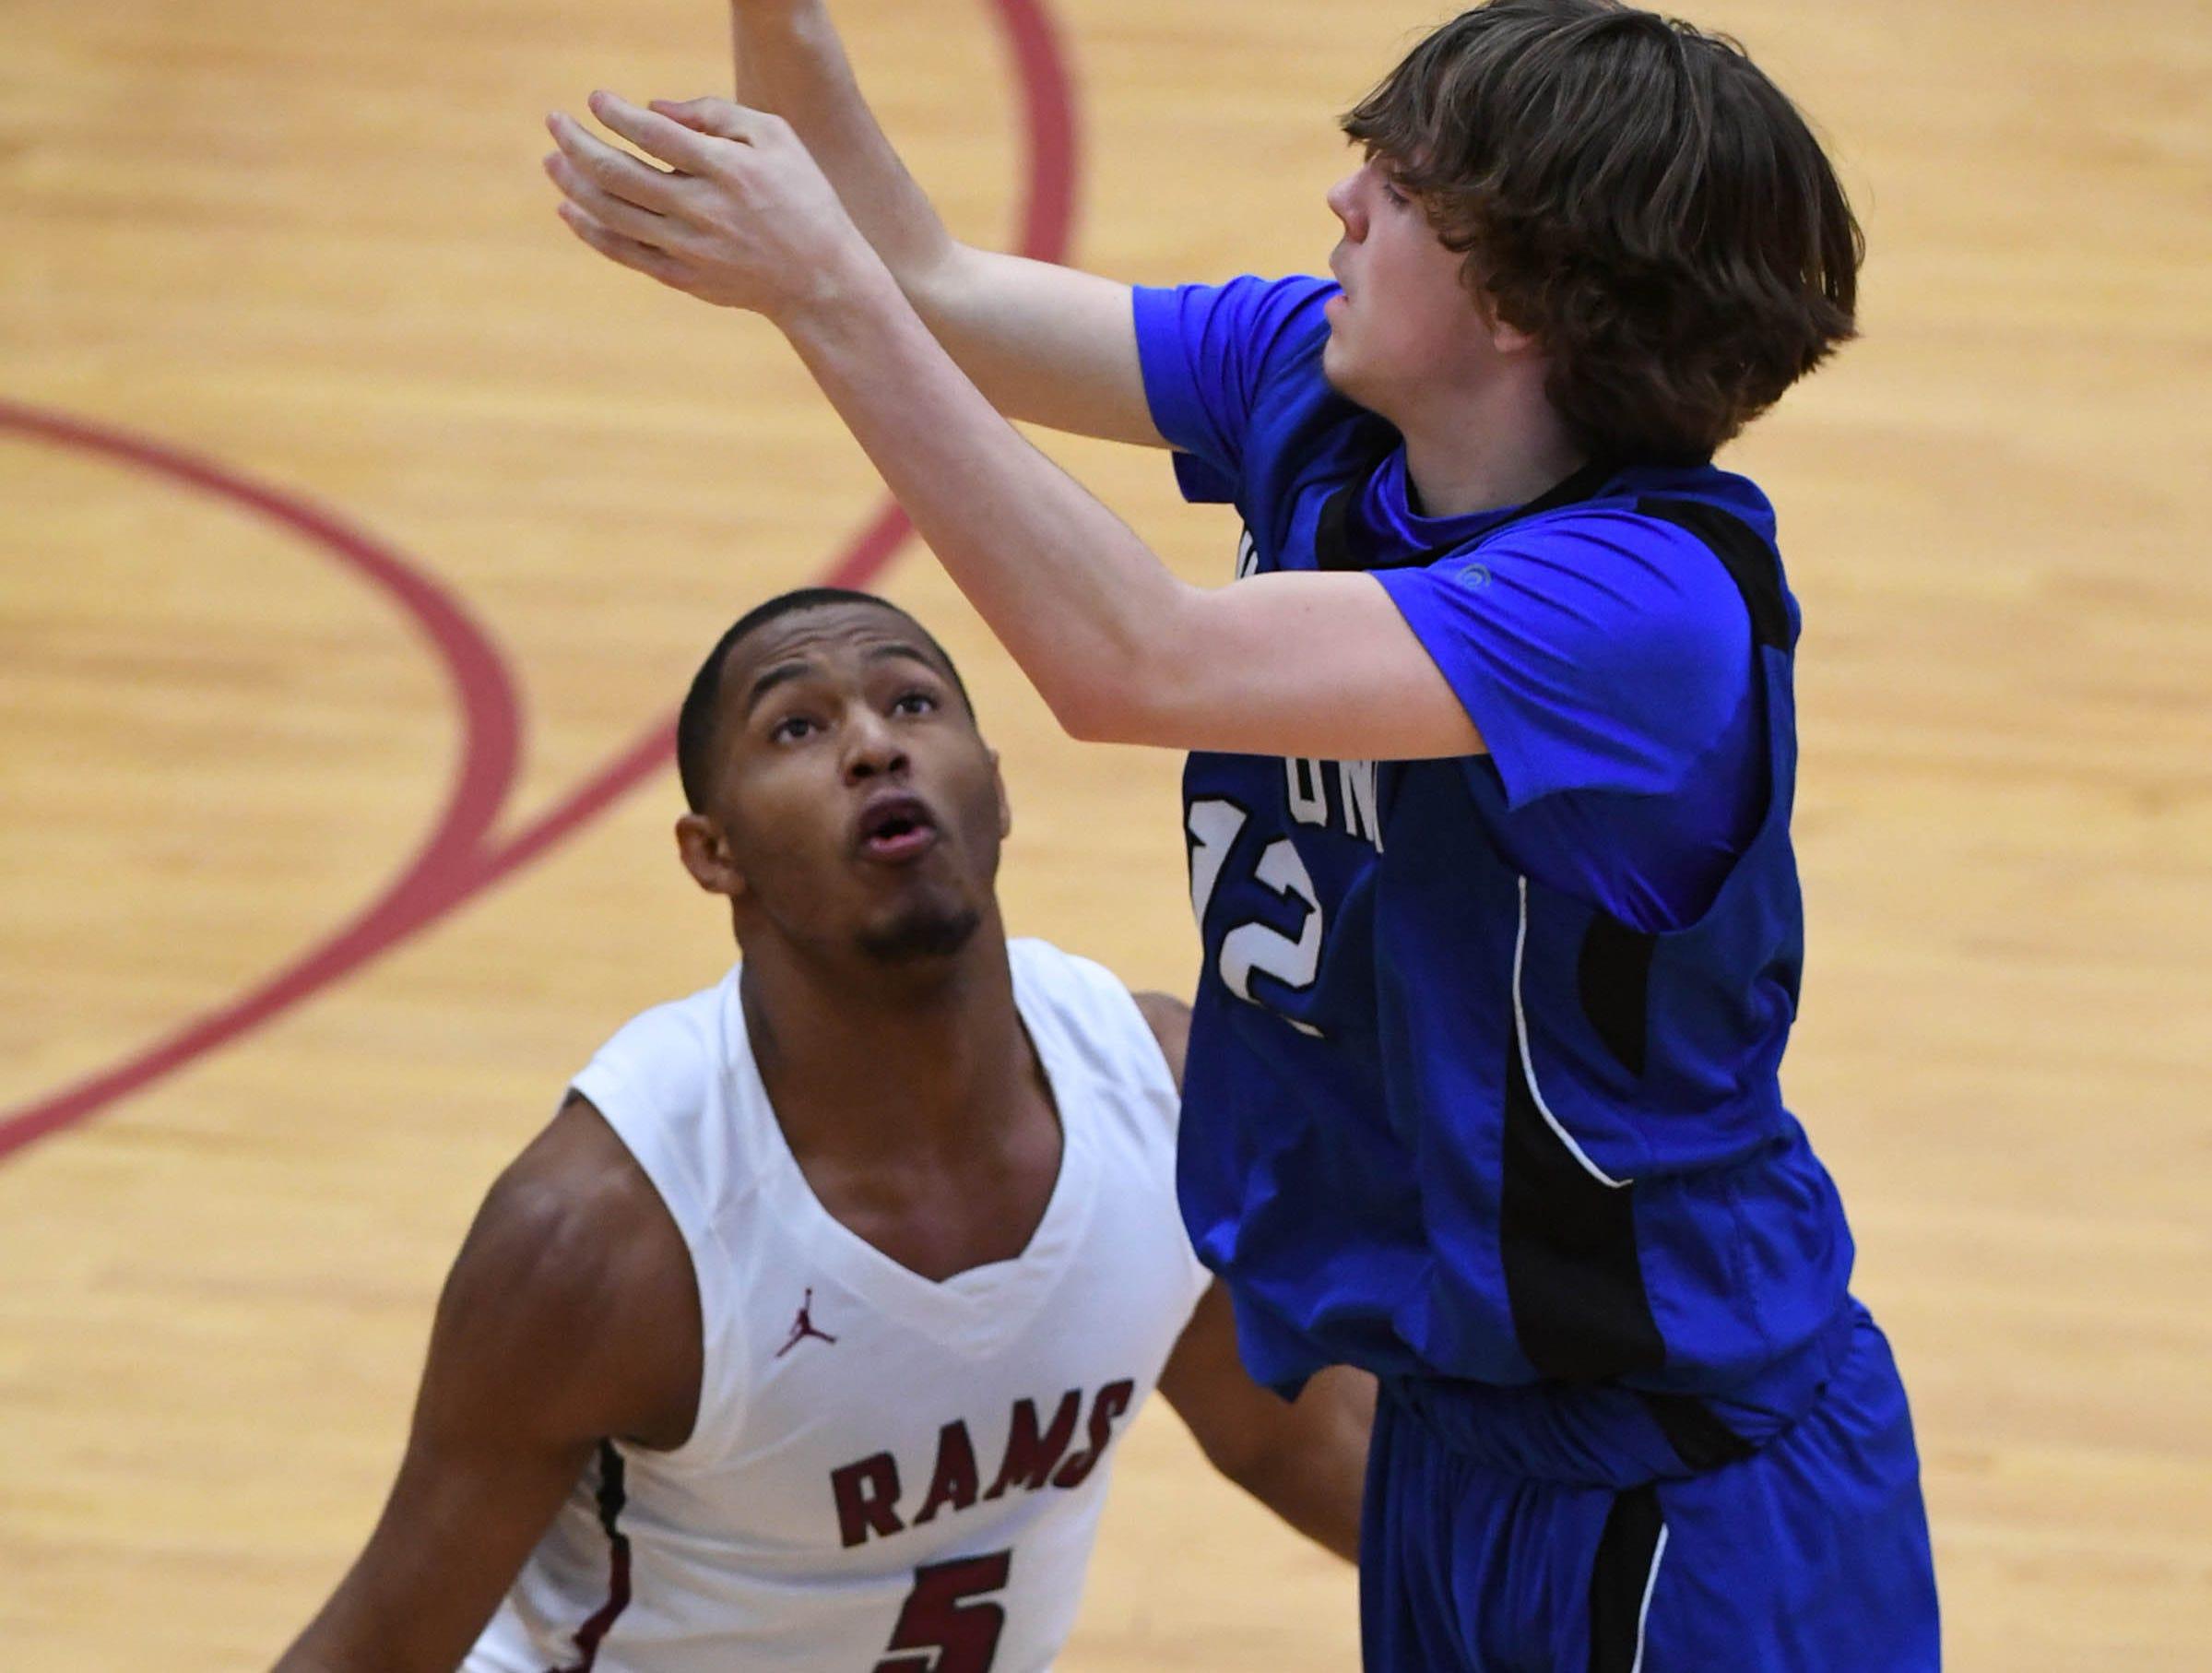 Westside senior Tim Johnson(5) defends Woodmont junior Spencer McAlister(12) during the fourth quarter at Westside High School in Anderson on Tuesday.